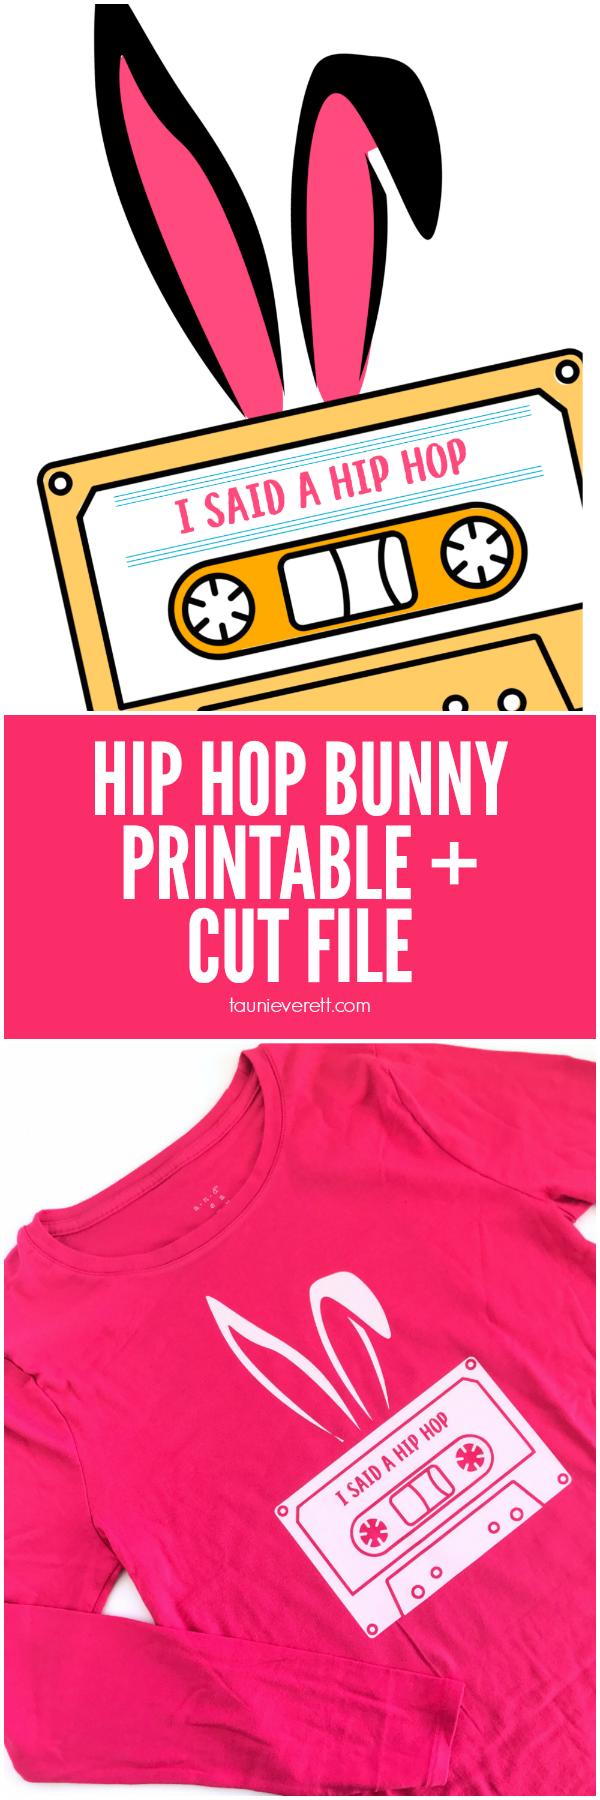 Easter Hip Hop Bunny Cut File and Printable #easterprintable #Easter #cricut #Silhouette